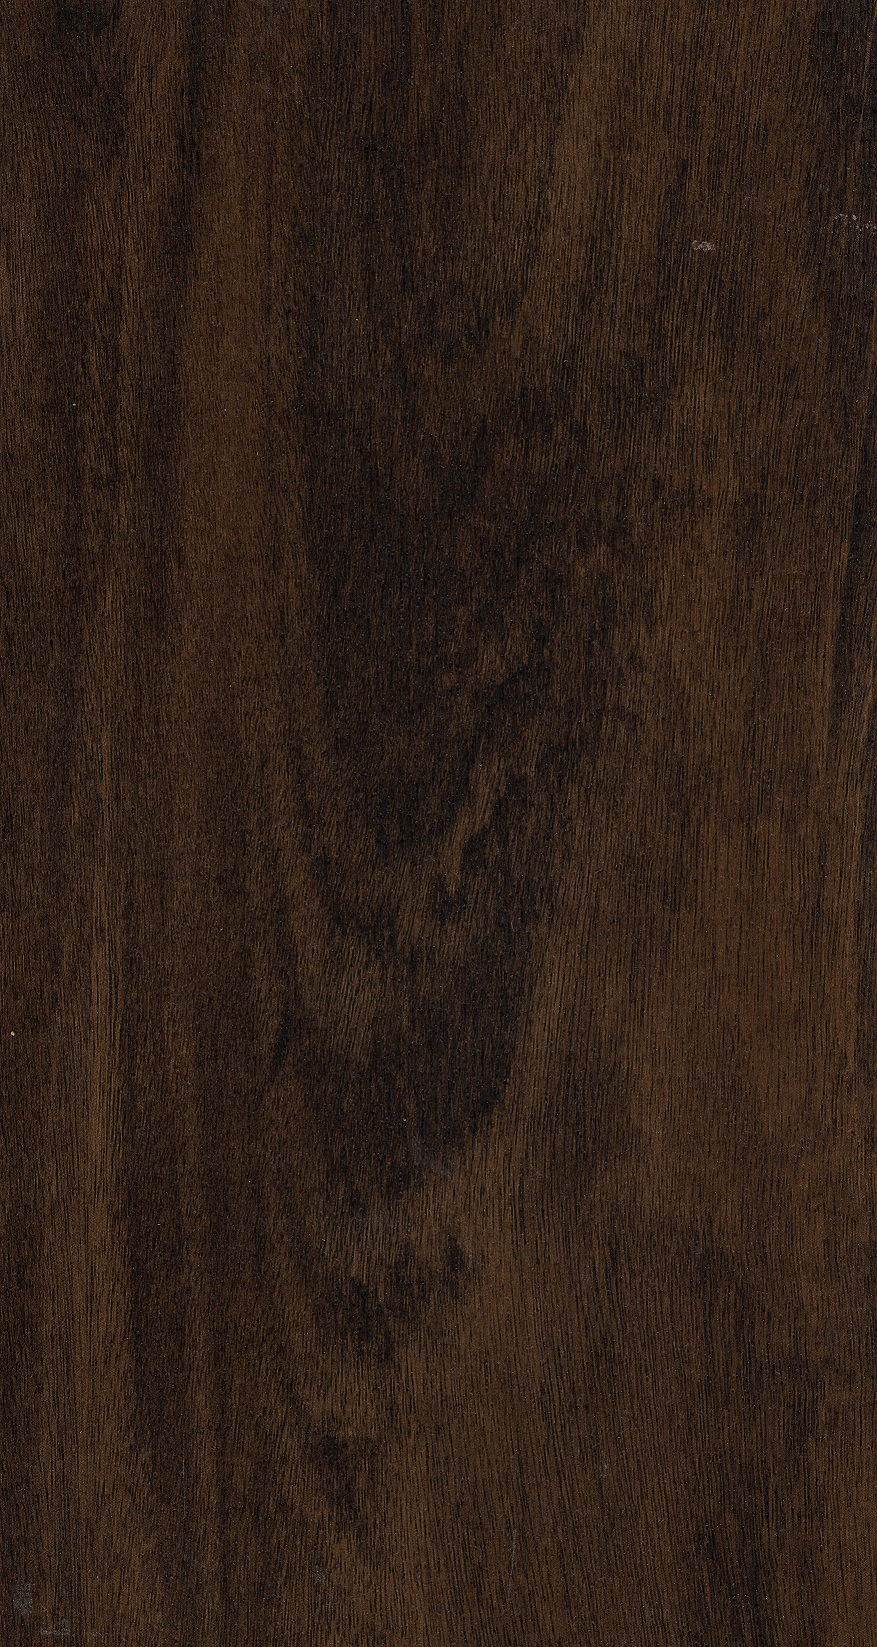 V11-W060-Woodtick